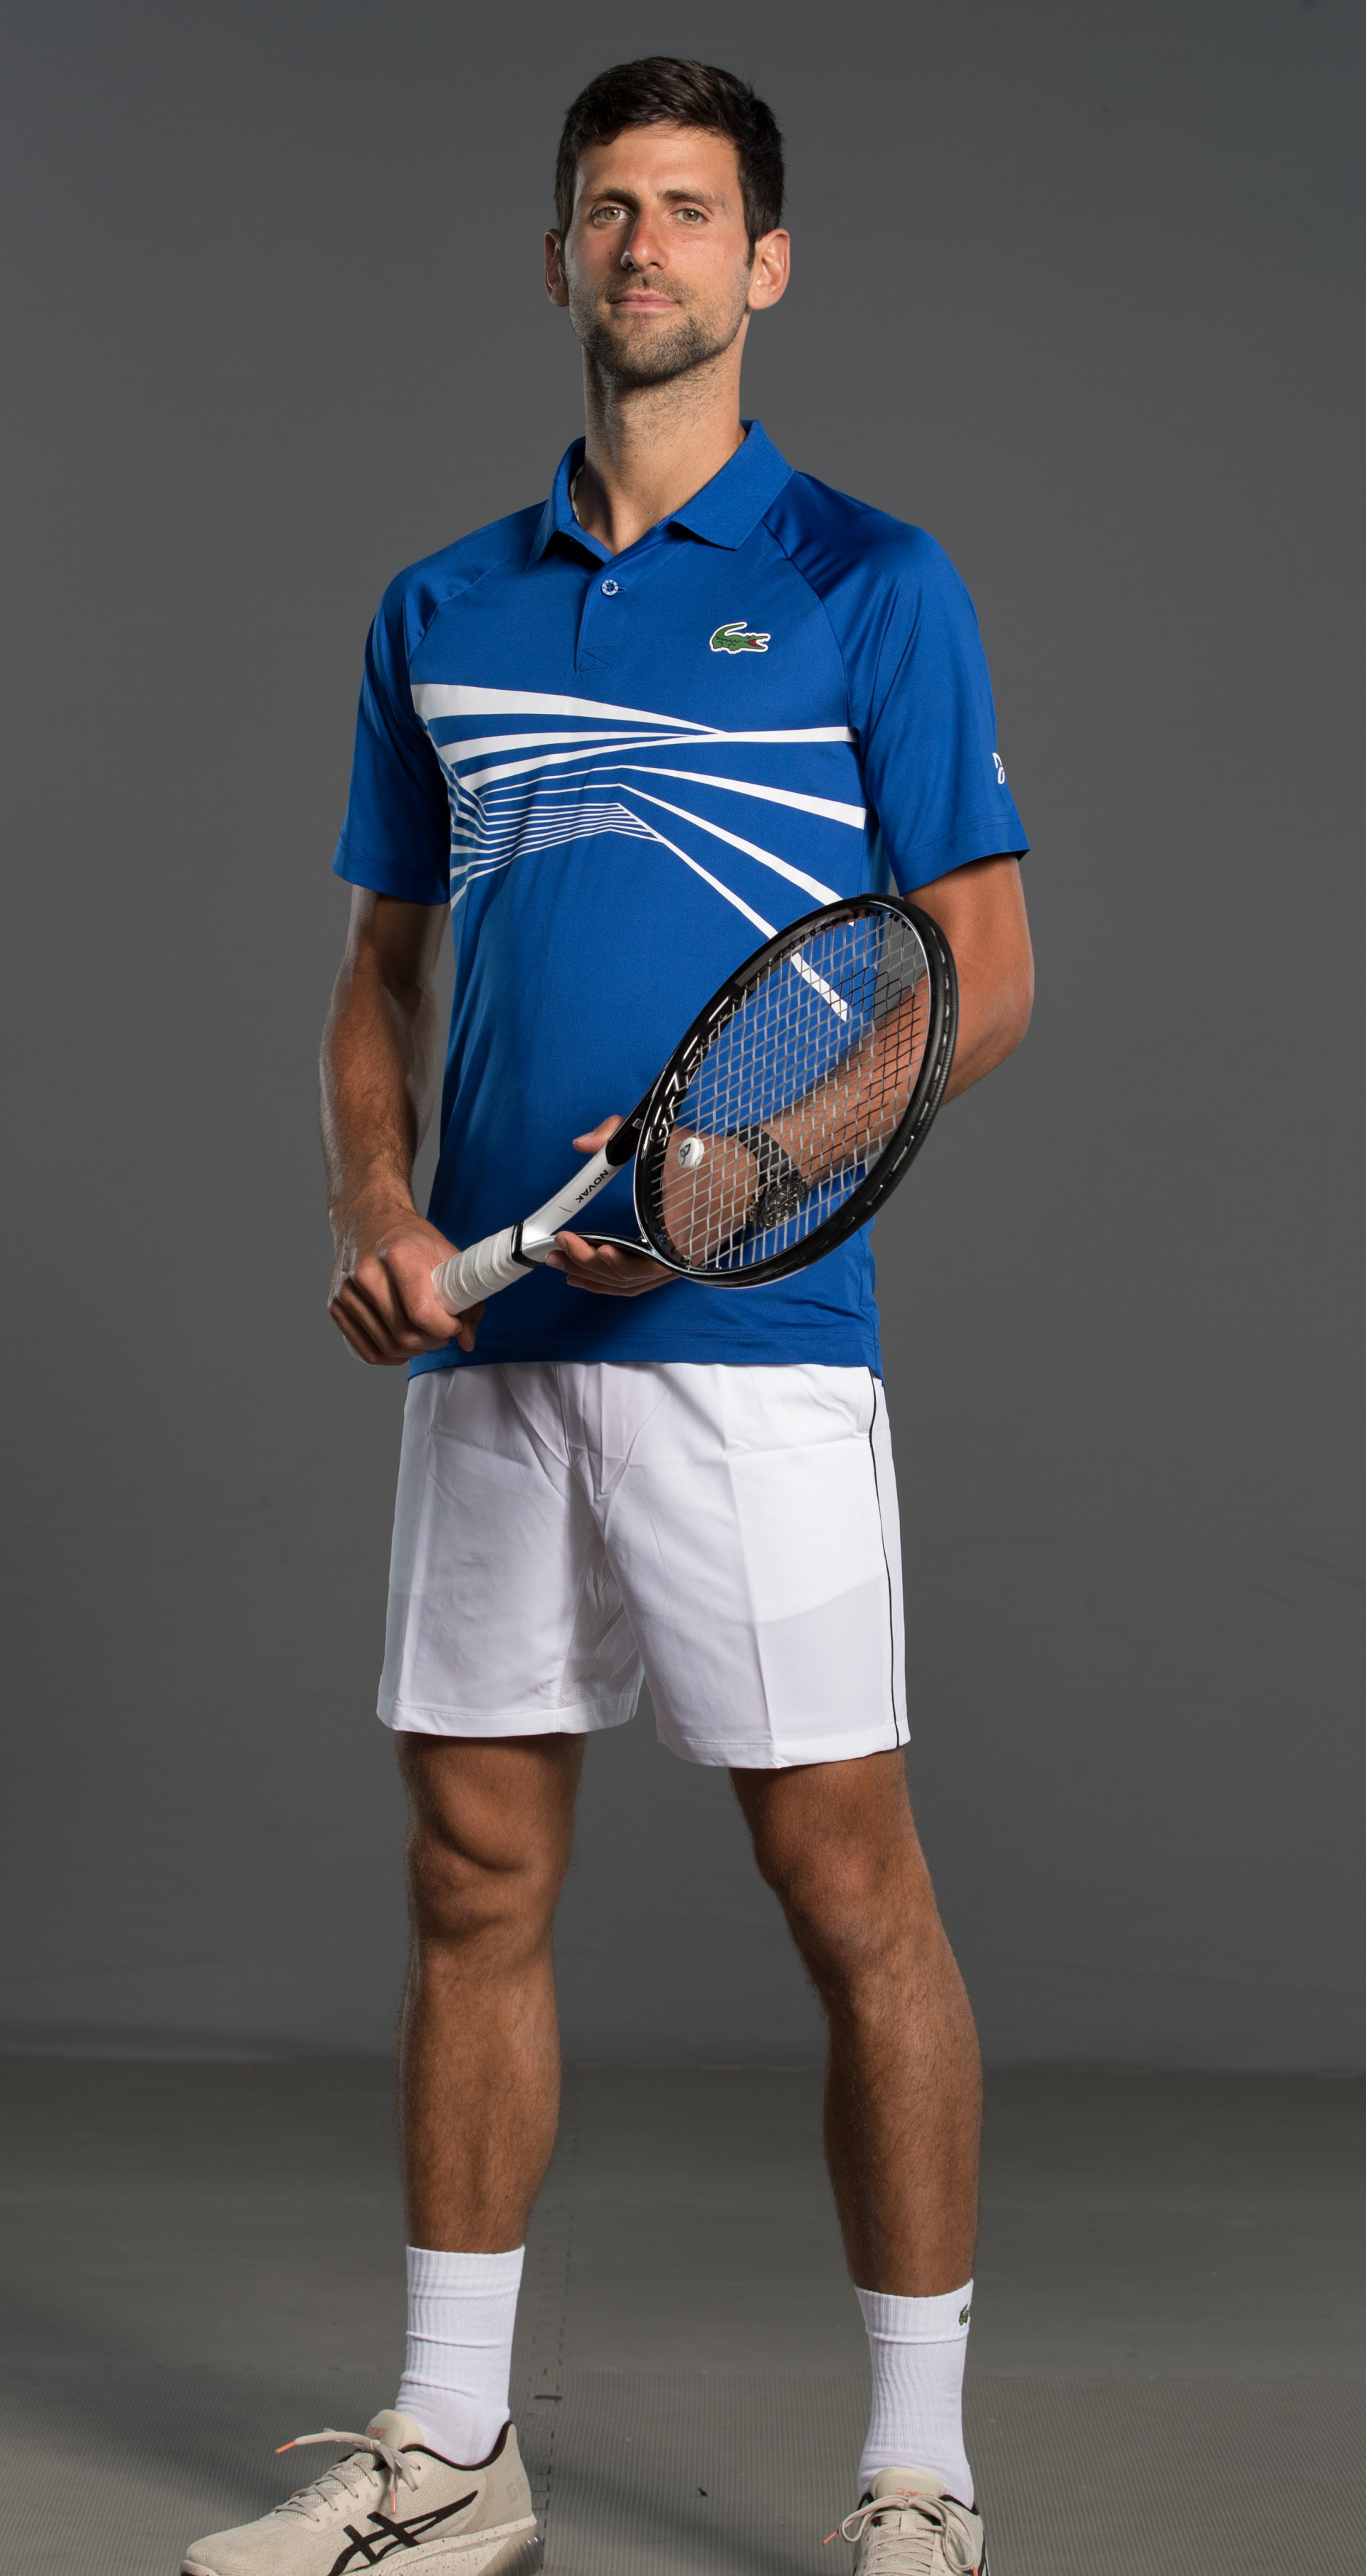 Tennis Star Novak Djokovic Wins July 2019 Hickok Belt